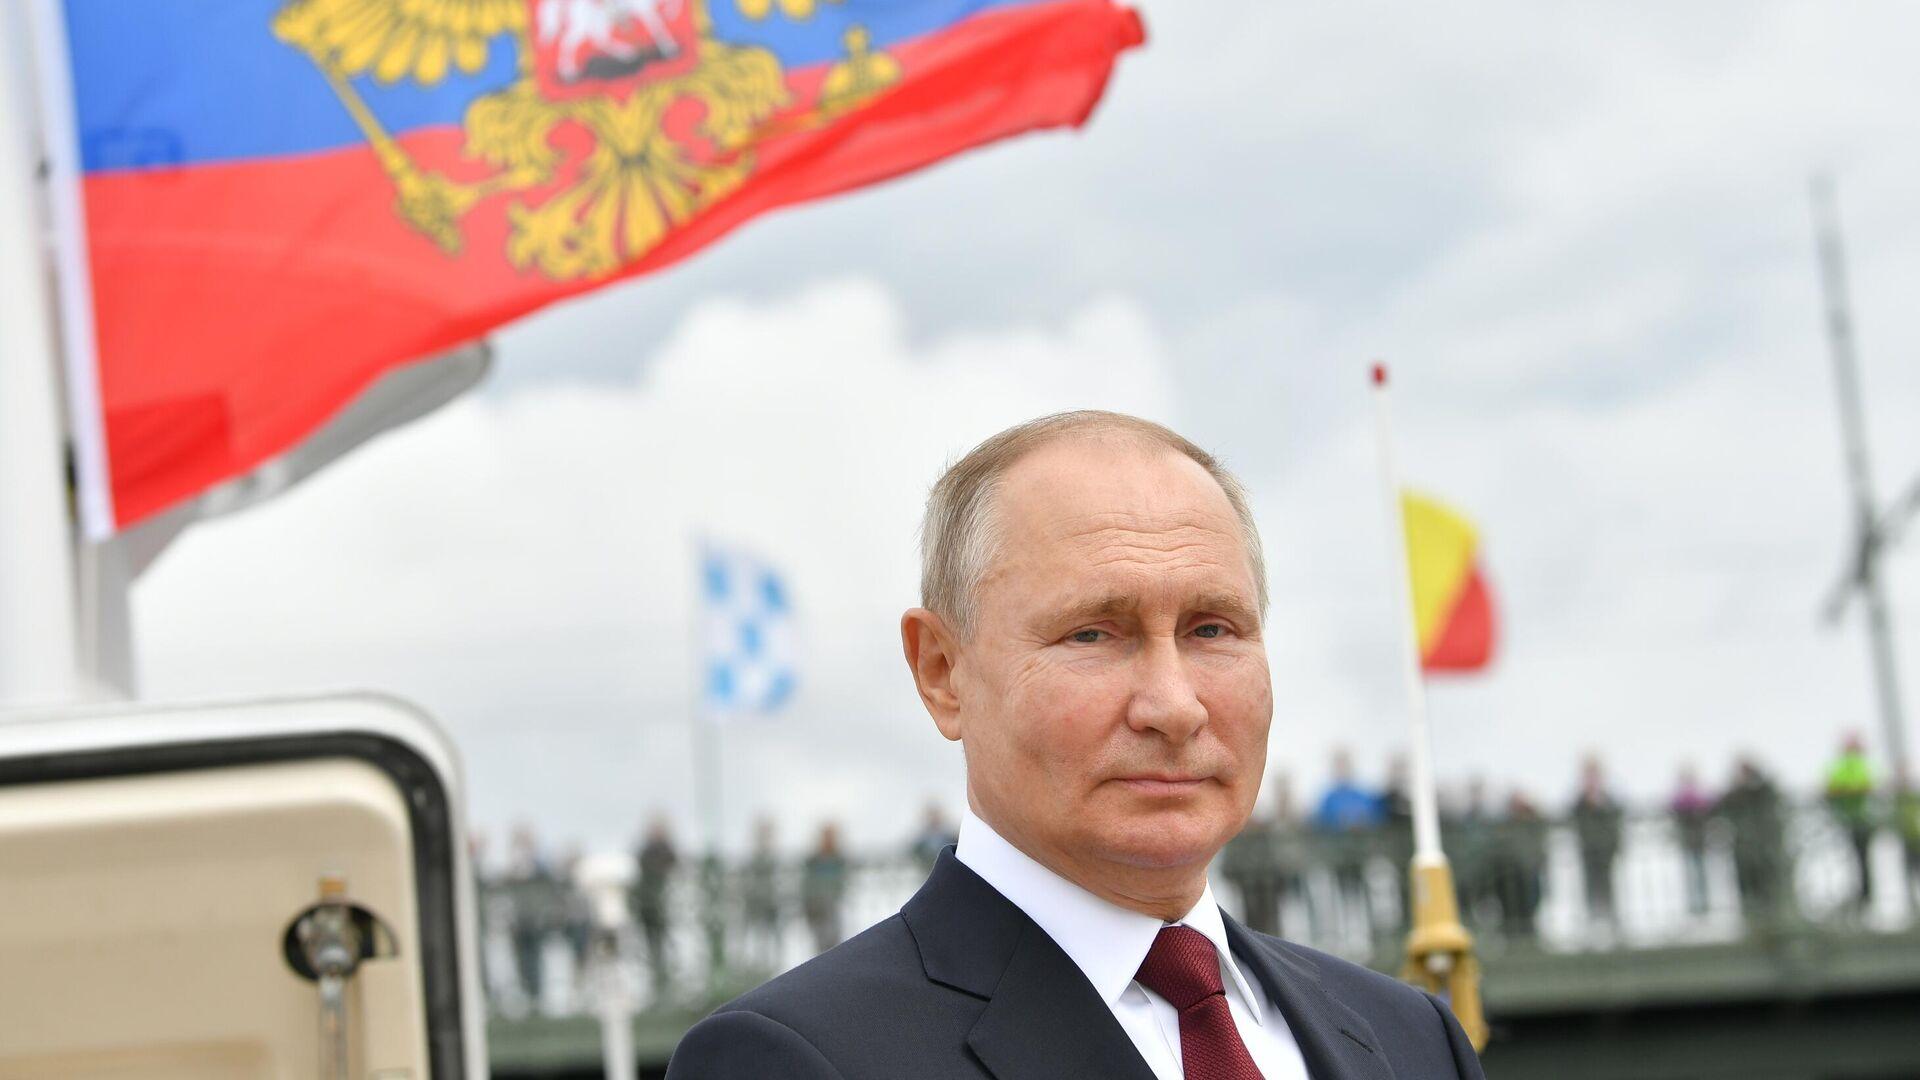 Vladimir Putin alla parata navale dedicata alla giornata della flotta russa - Sputnik Italia, 1920, 09.08.2021